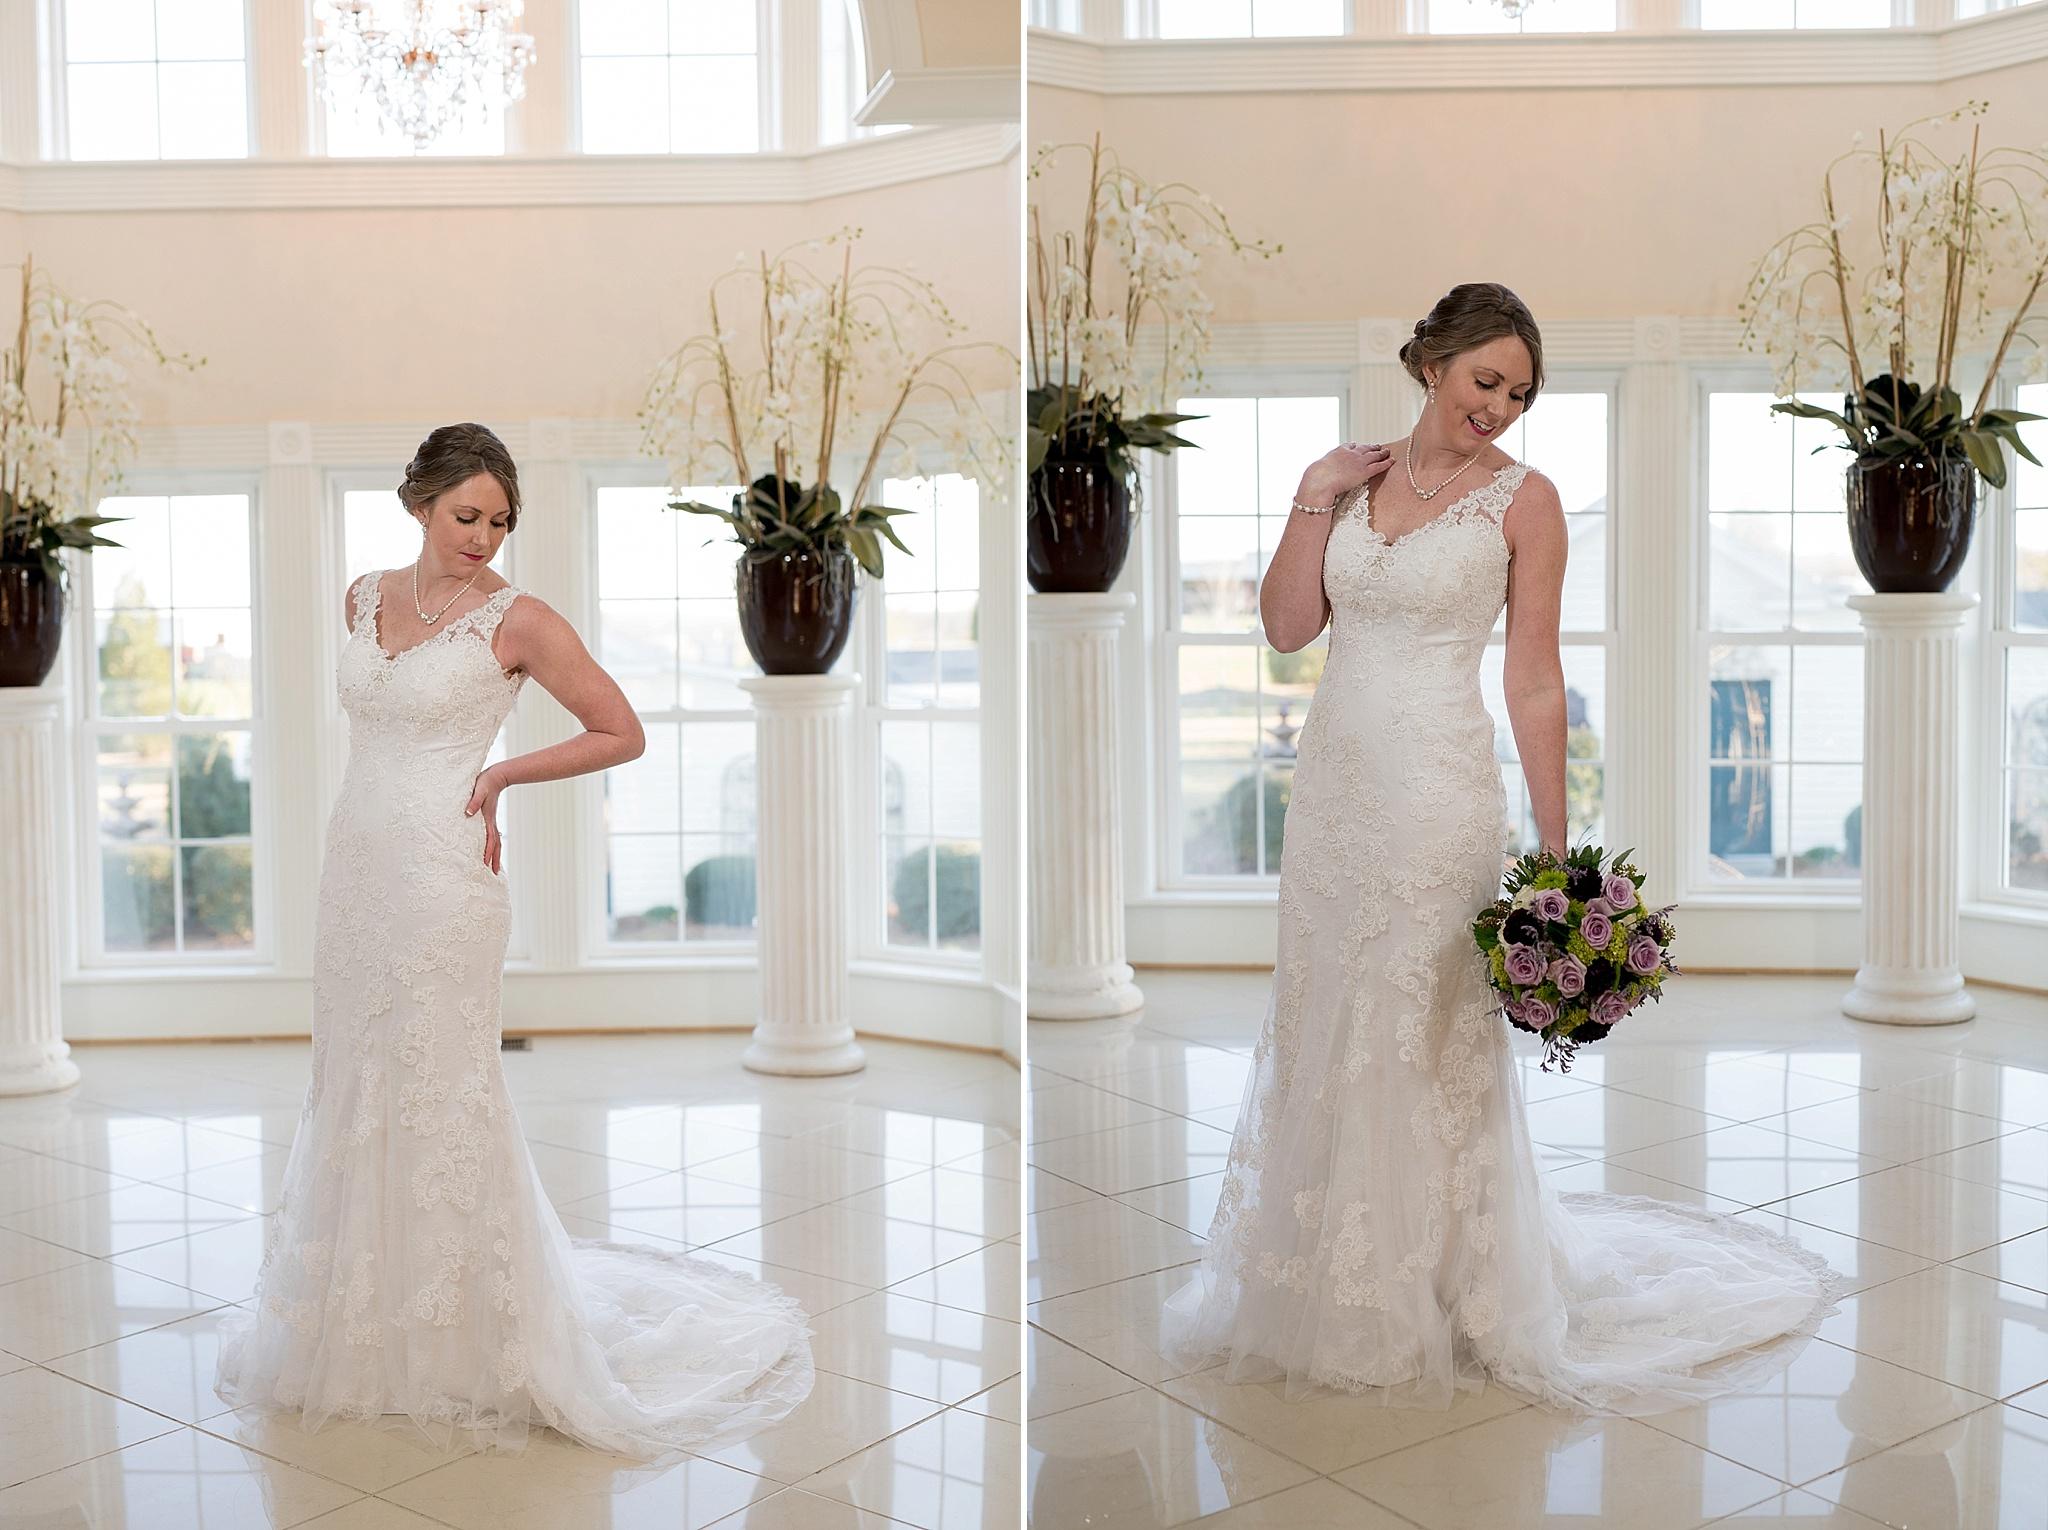 Yankee-Hall-Plantation-Wedding-NC-Photographer-0156.jpg